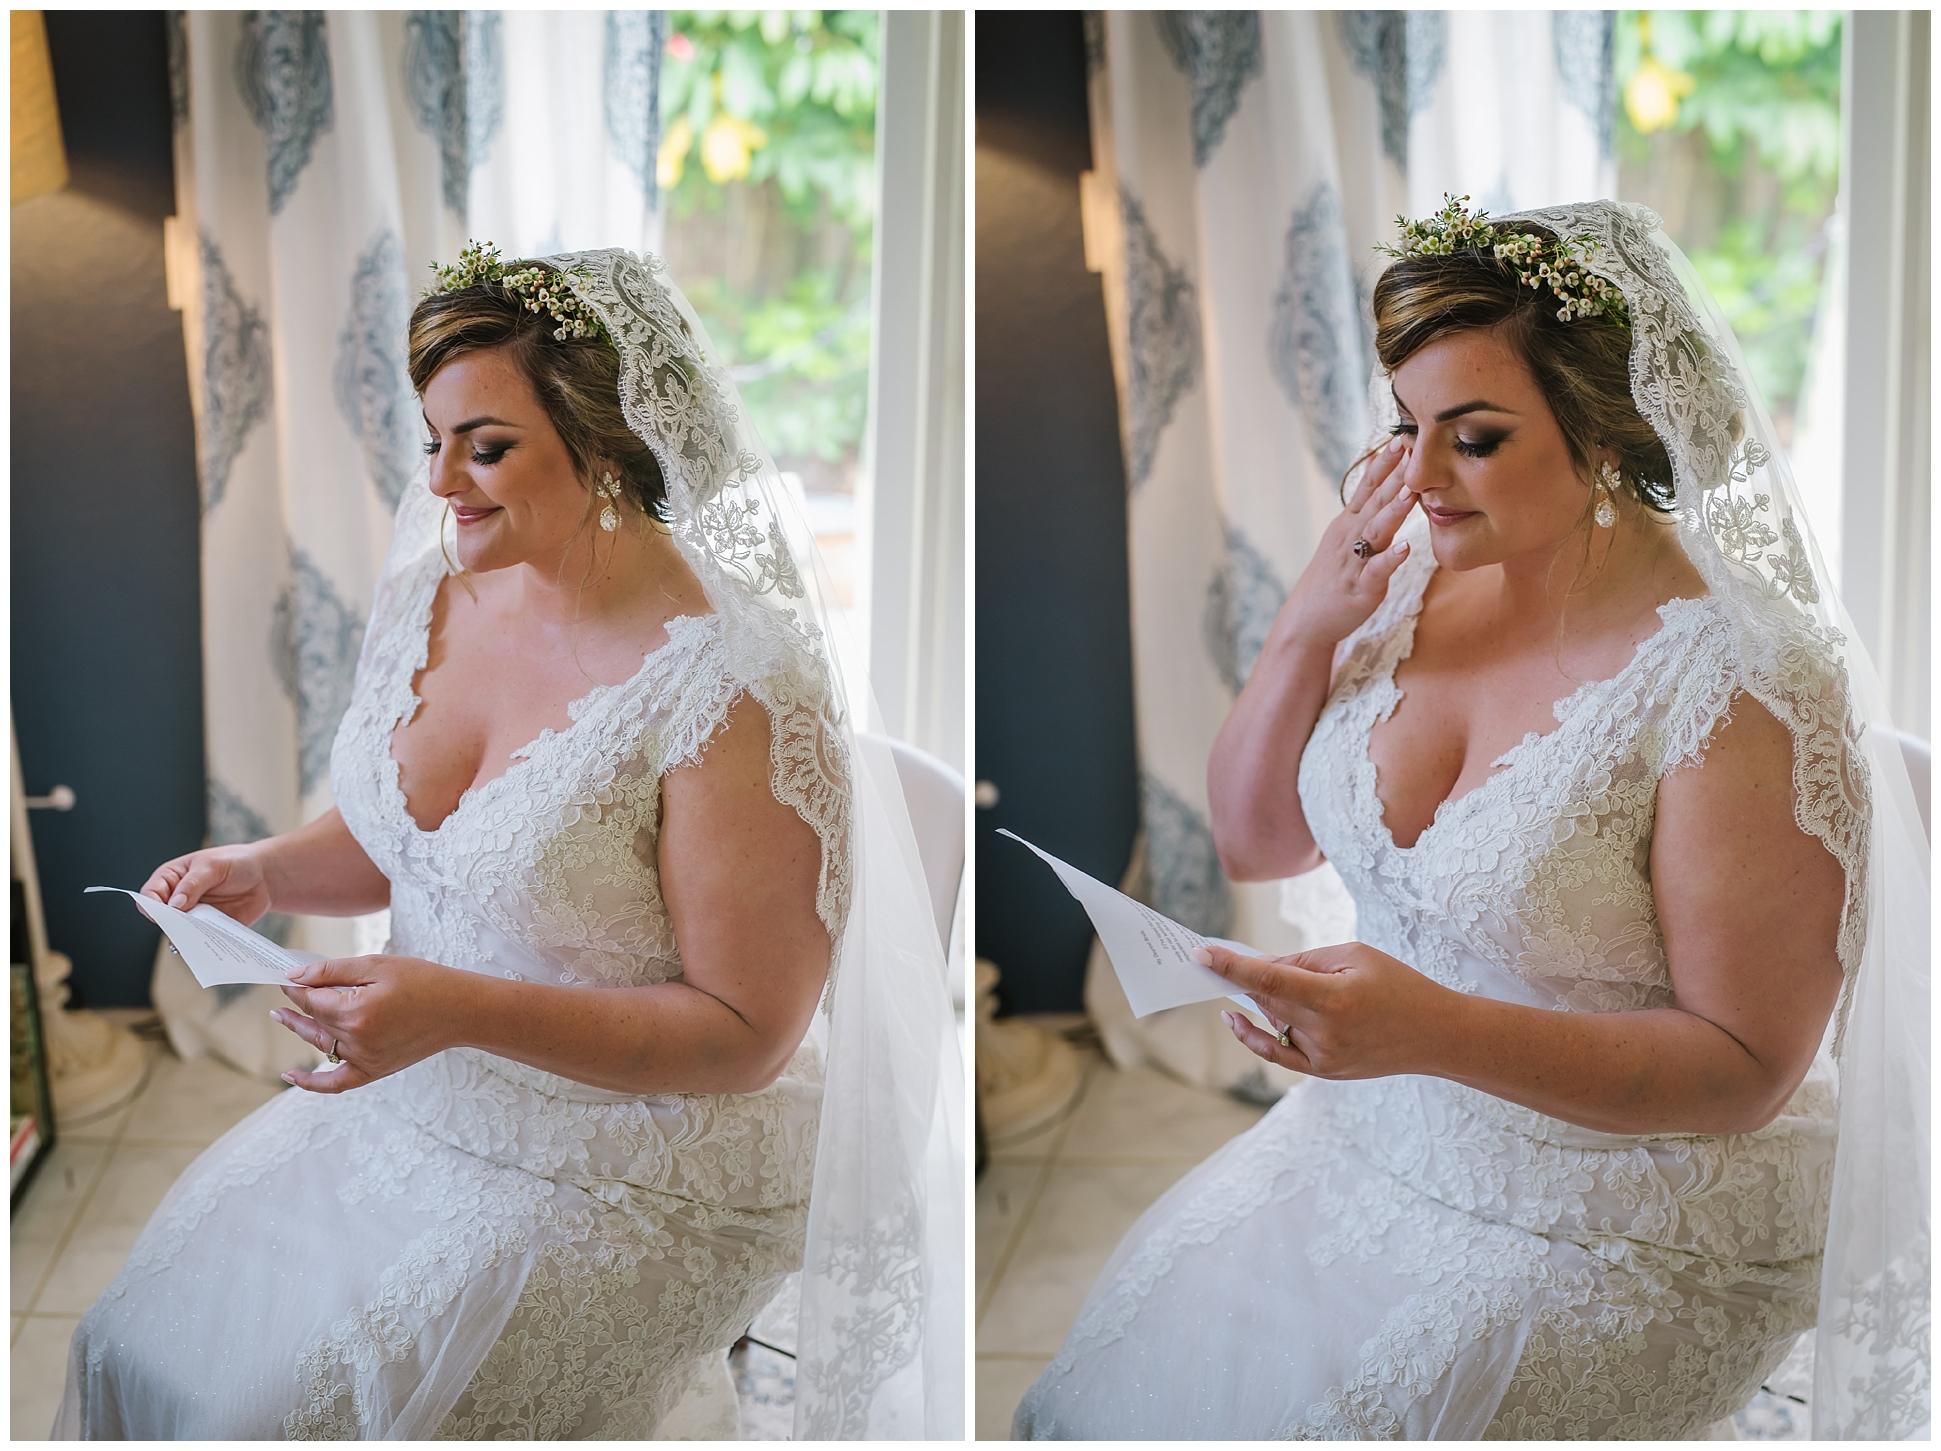 st-pete-wedding-photographer-italian-romance-theme-rustic-flower-crown_0383.jpg